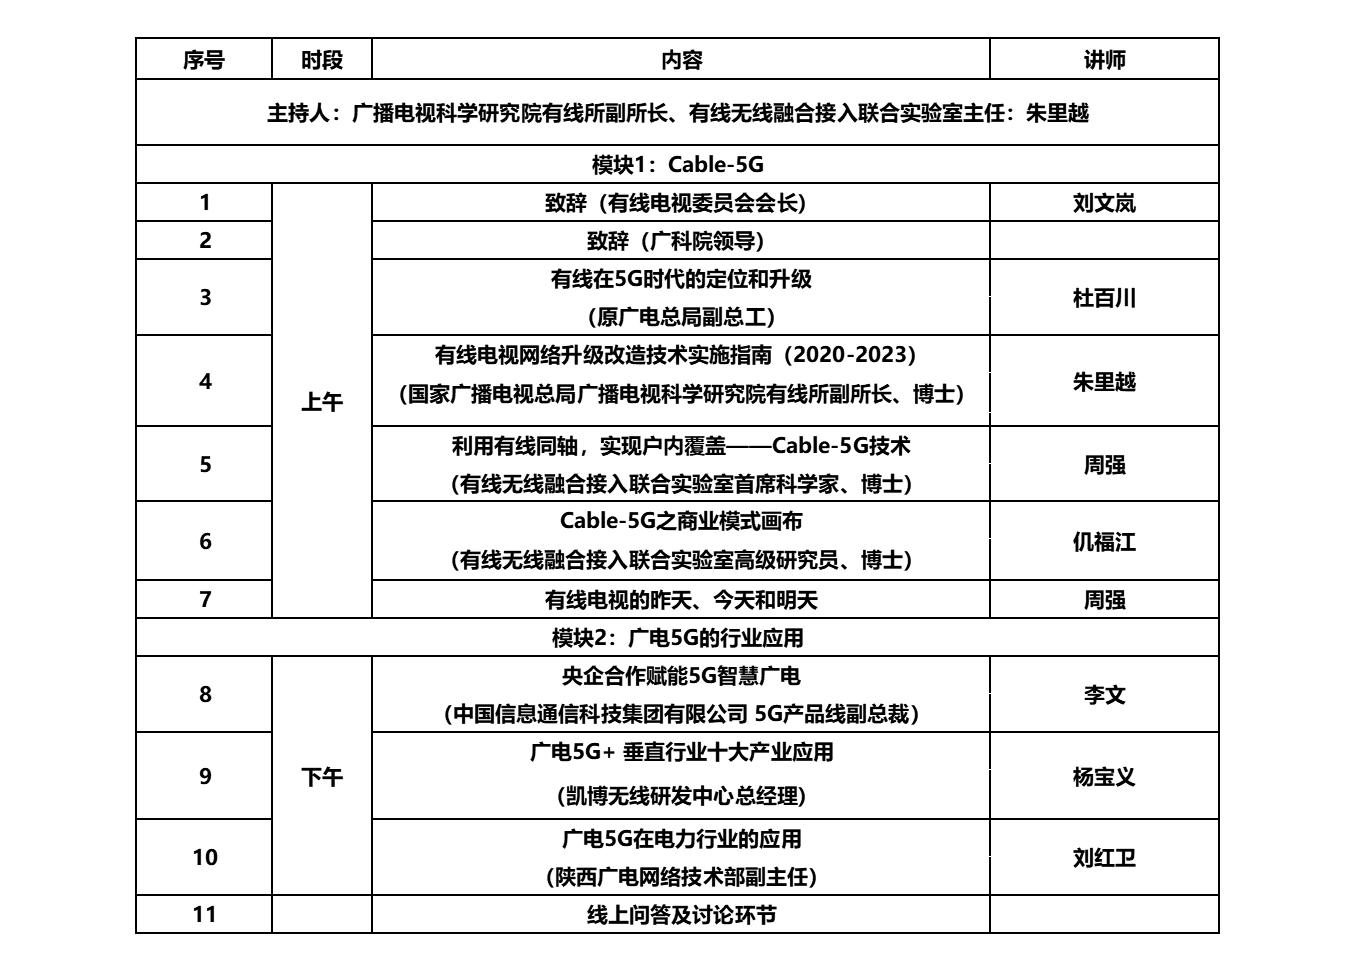 https://sslprod.oss-cn-shanghai.aliyuncs.com/stable/markdown_pic/20210113/12203/30529878/1610498025570.jpg